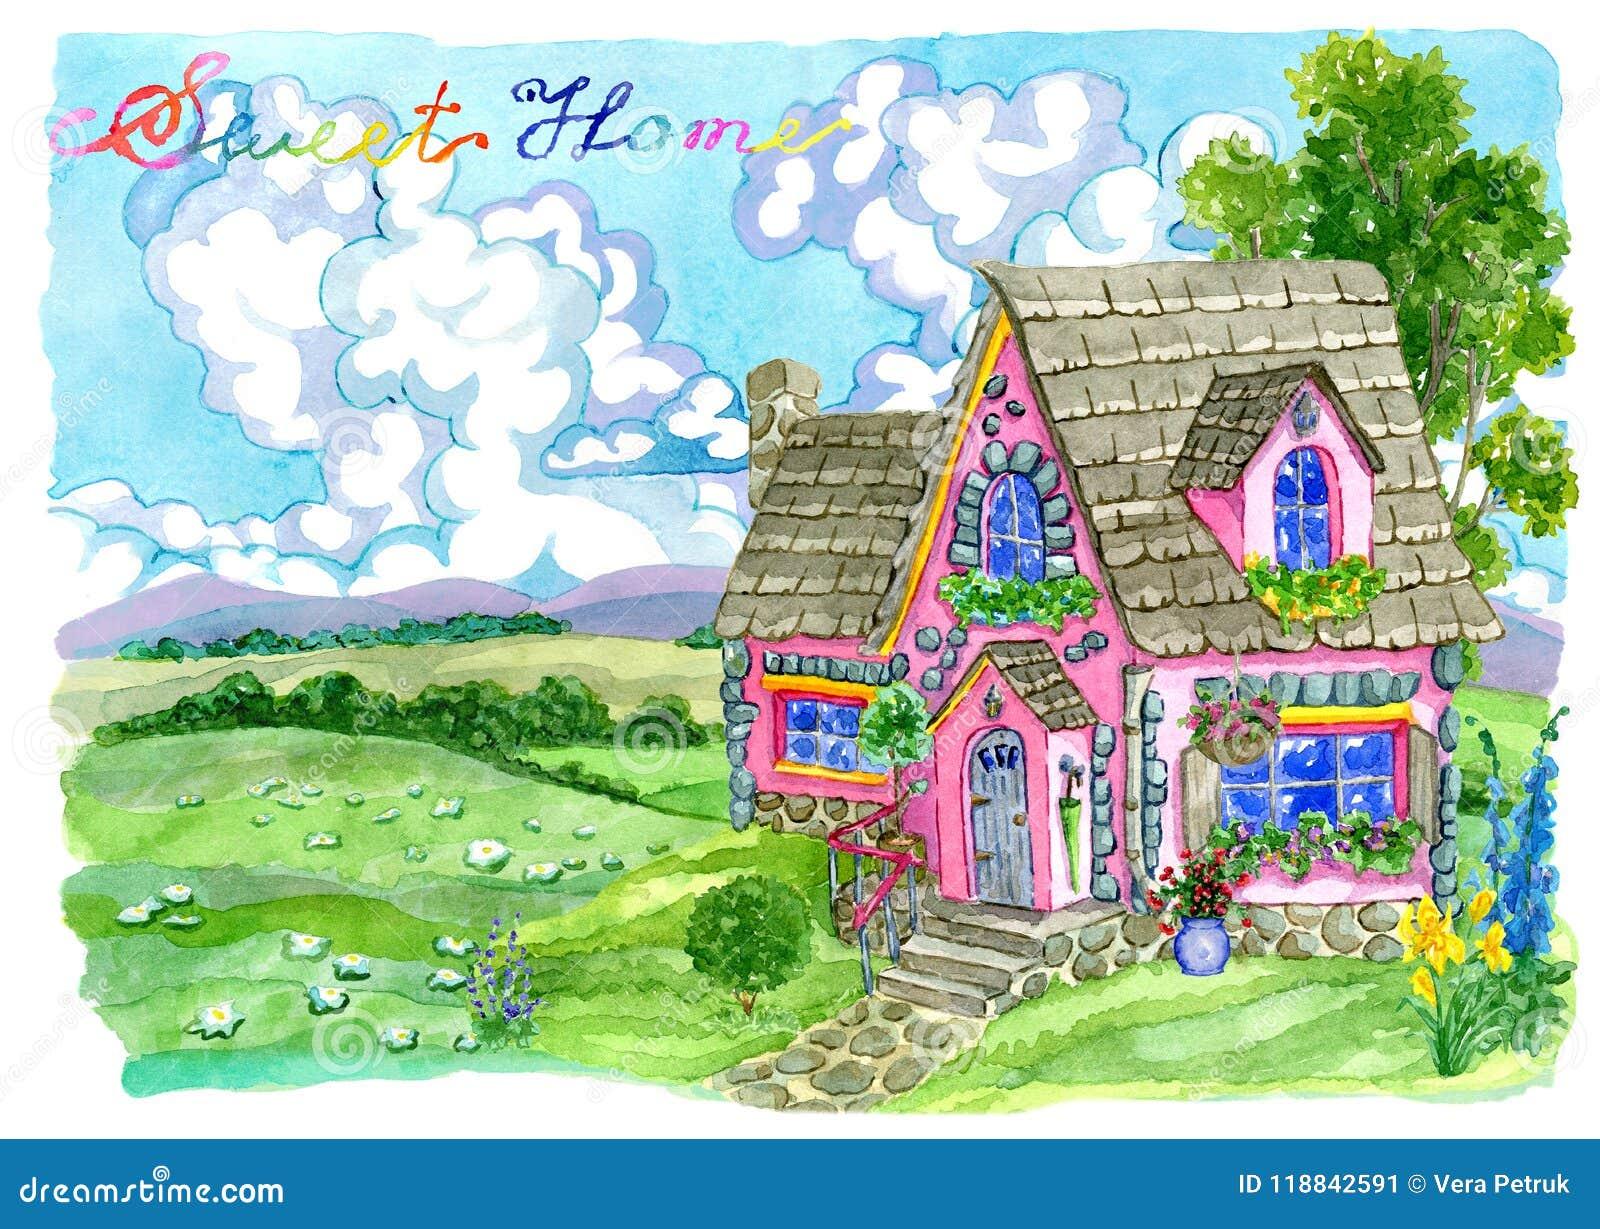 Cute pink cottage with garden flowers against grassland